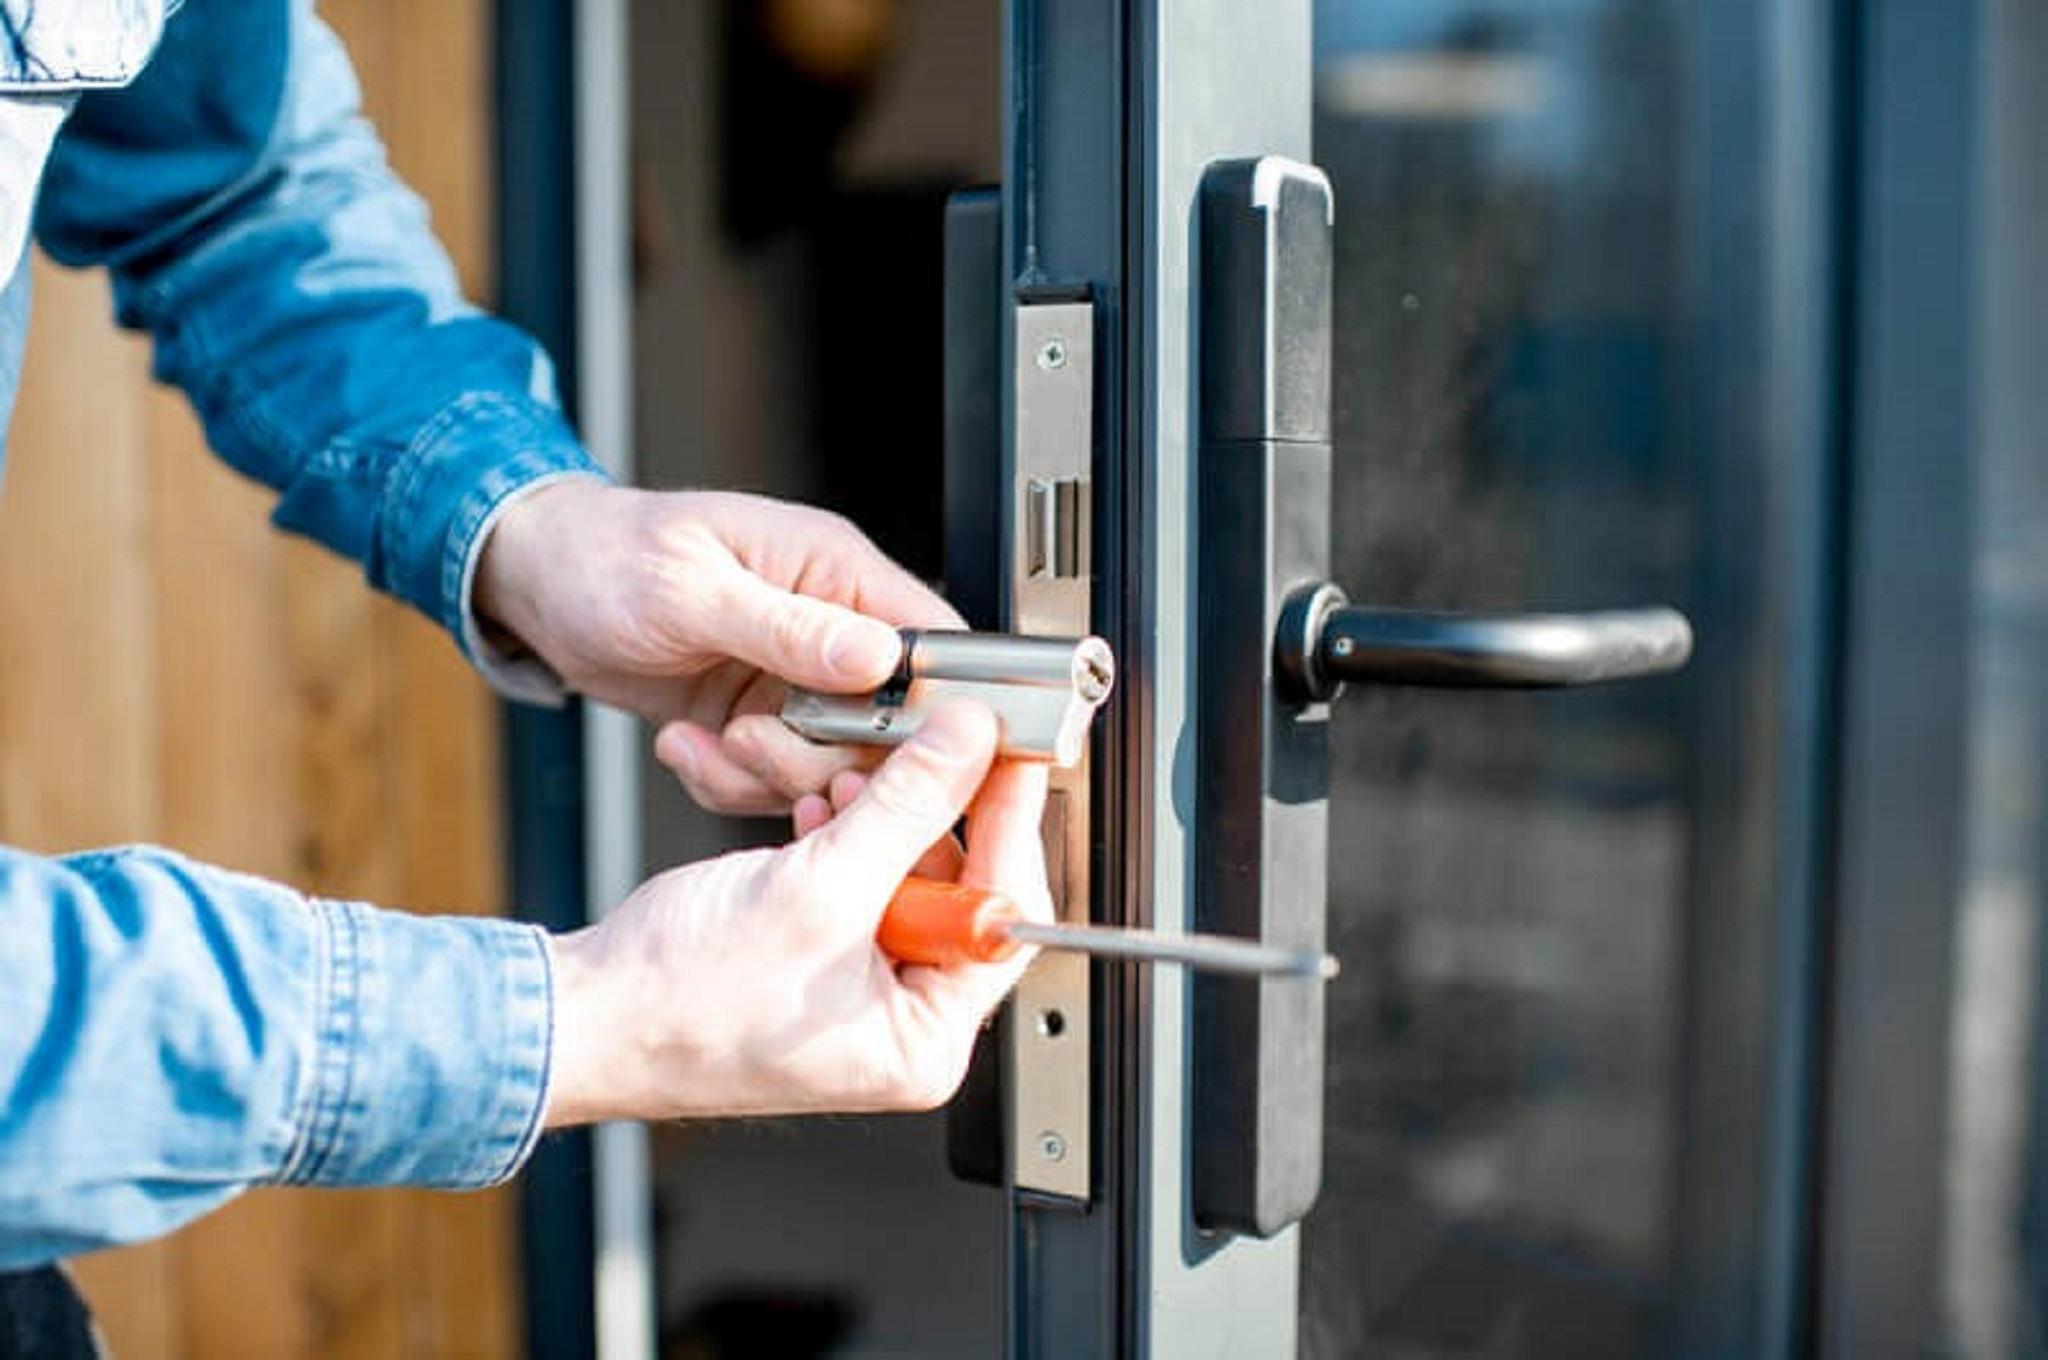 Residential locksmith services